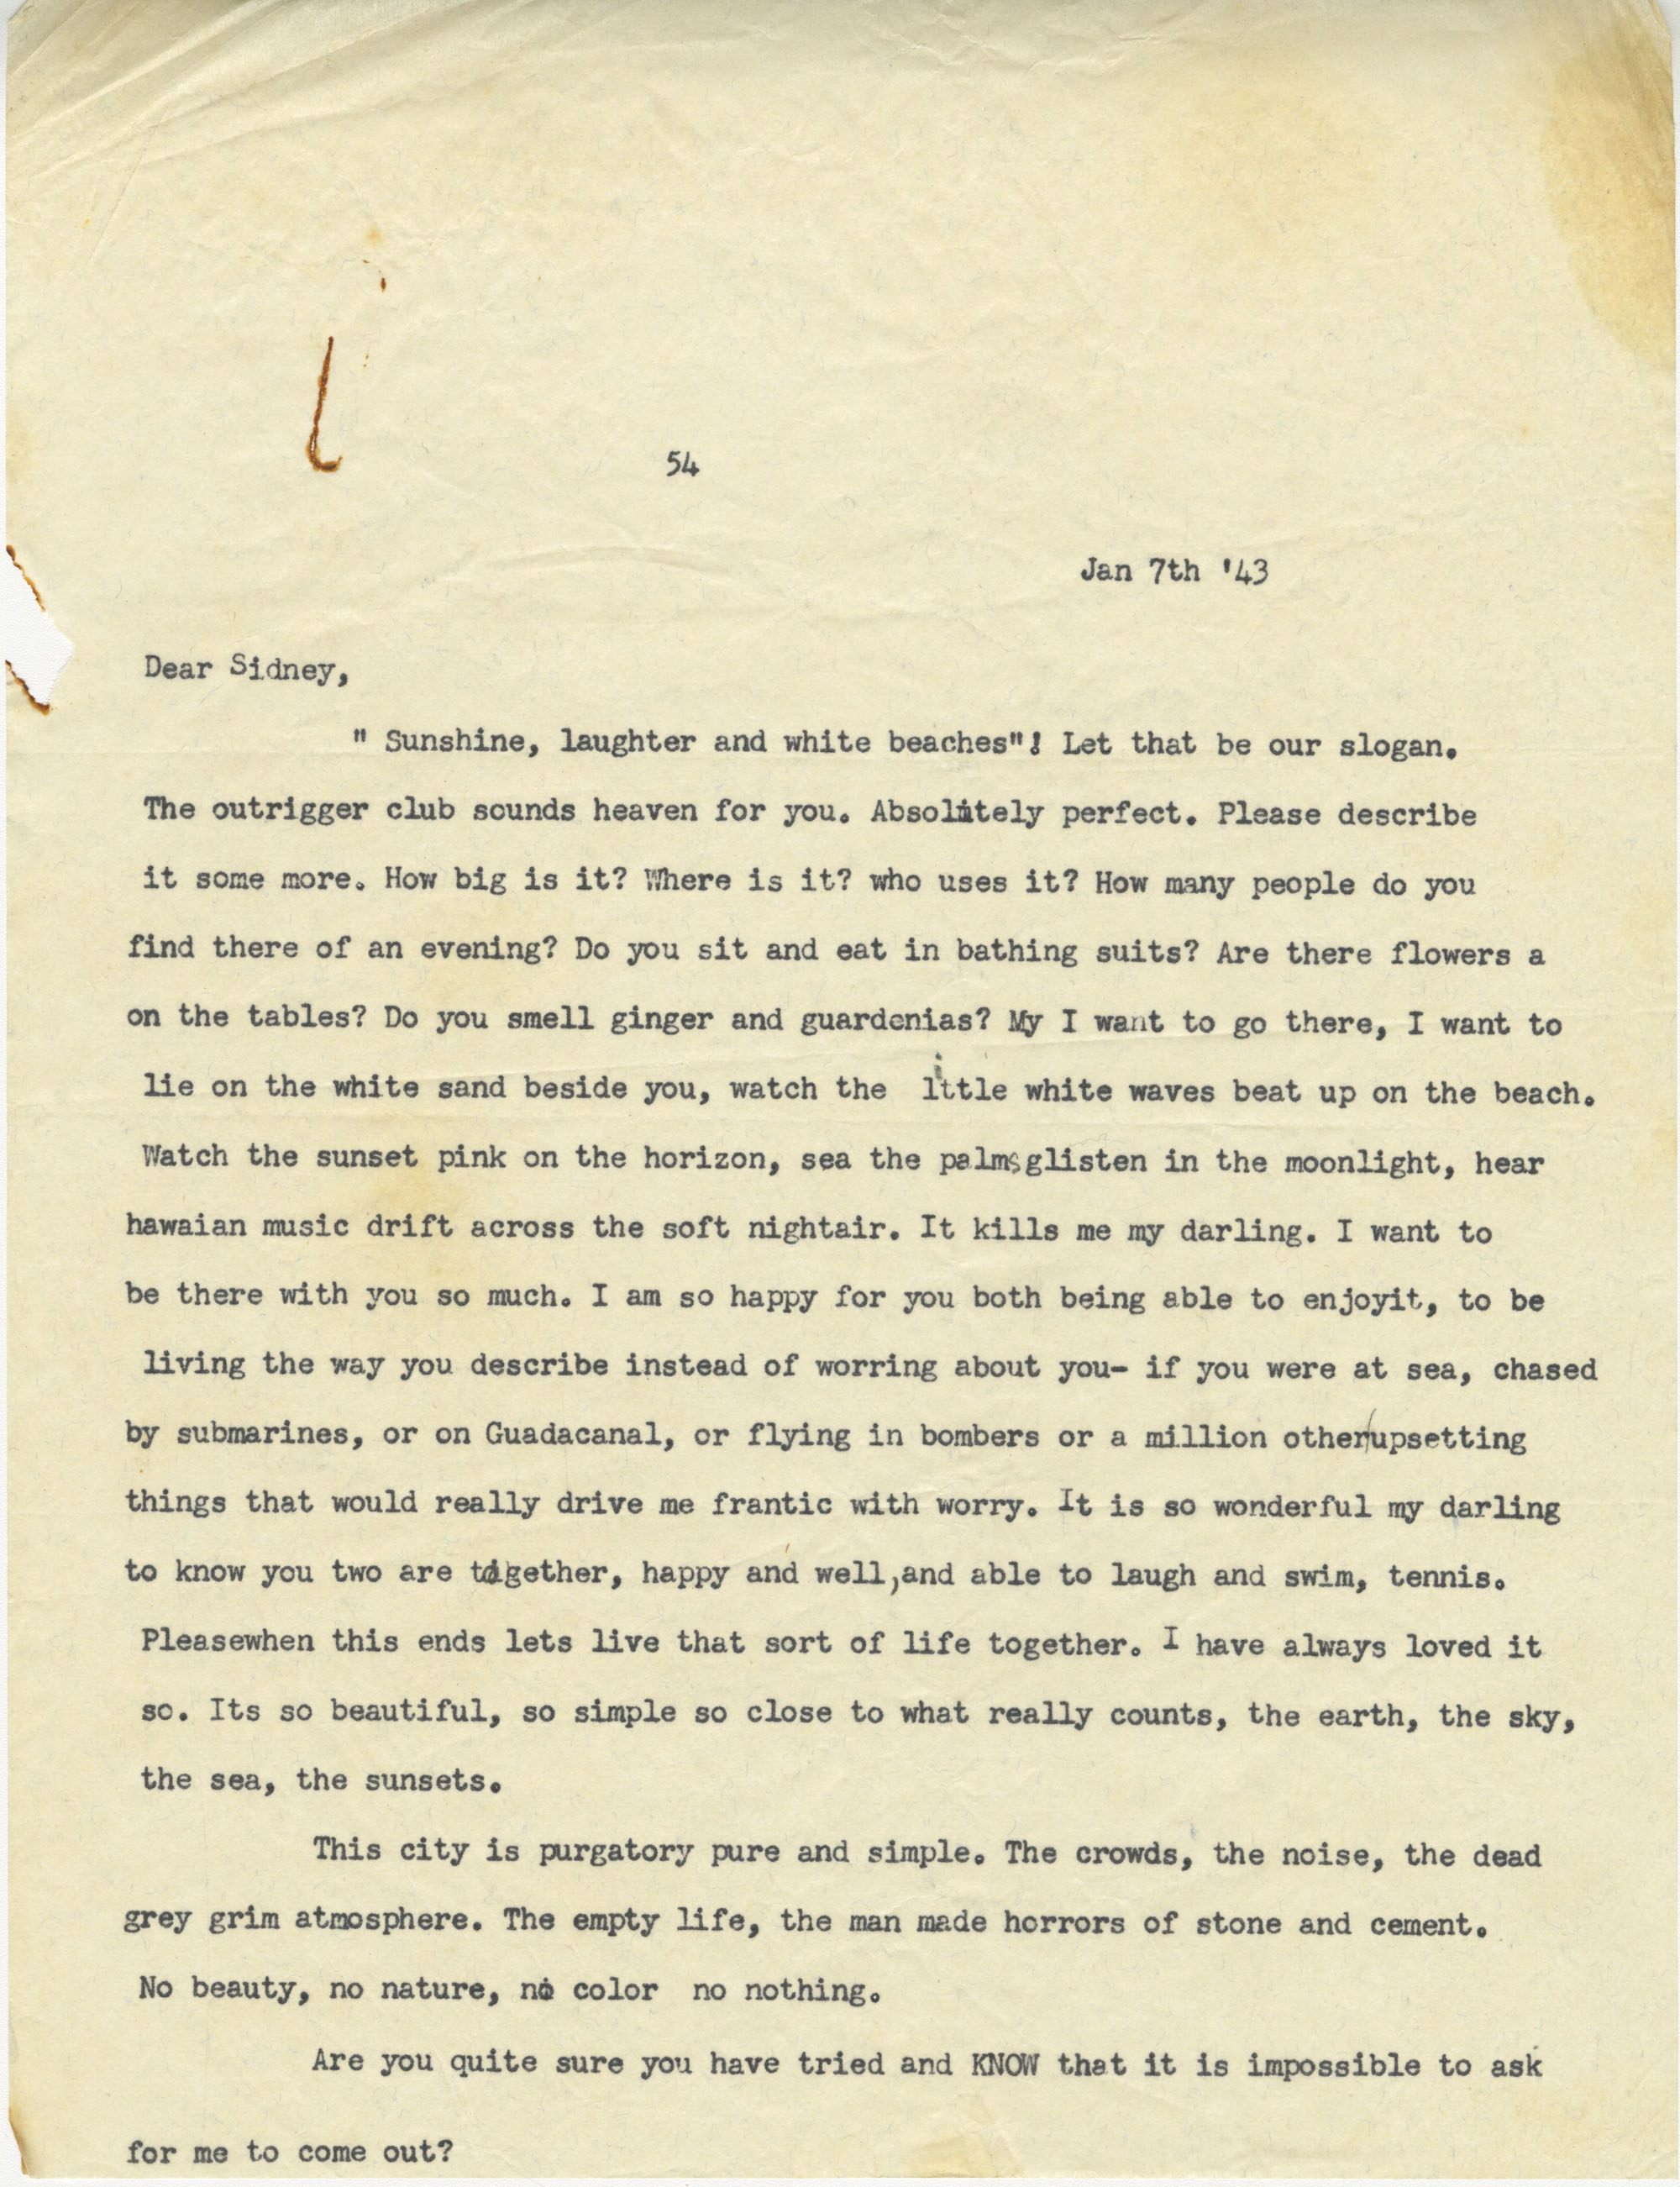 Letter from Gertrude Sanford Legendre, January 7, 1943